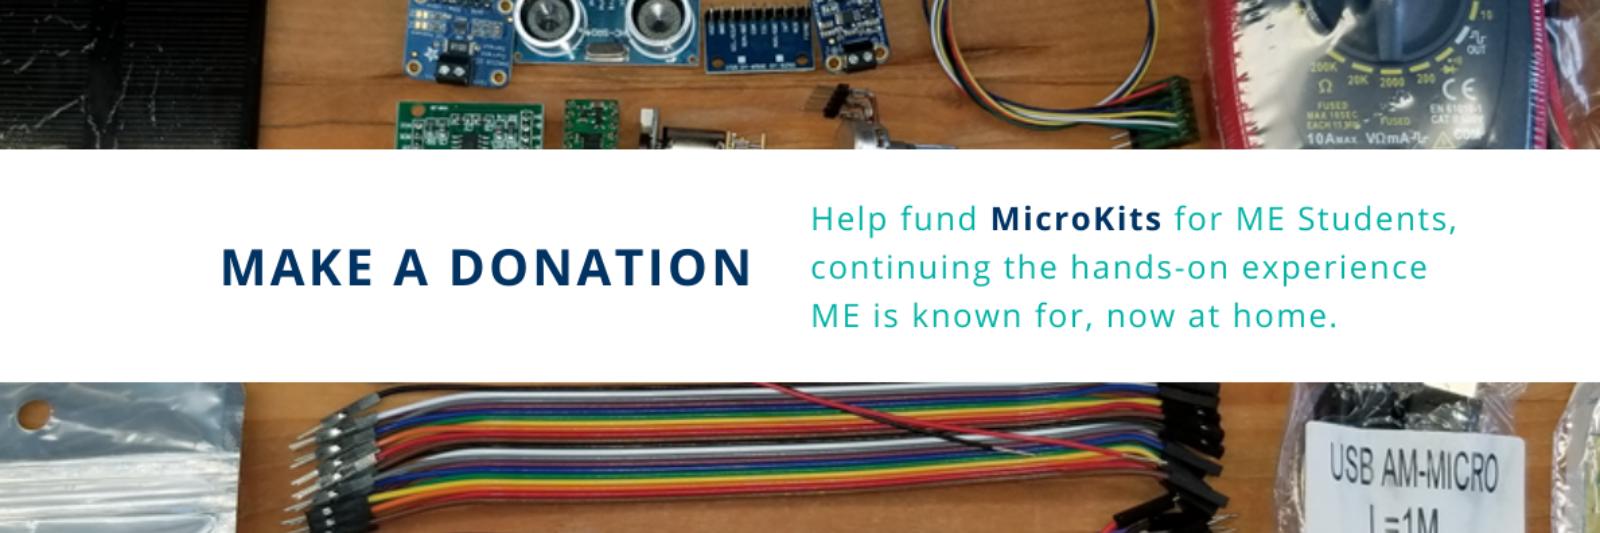 MicroKit Donation Banner